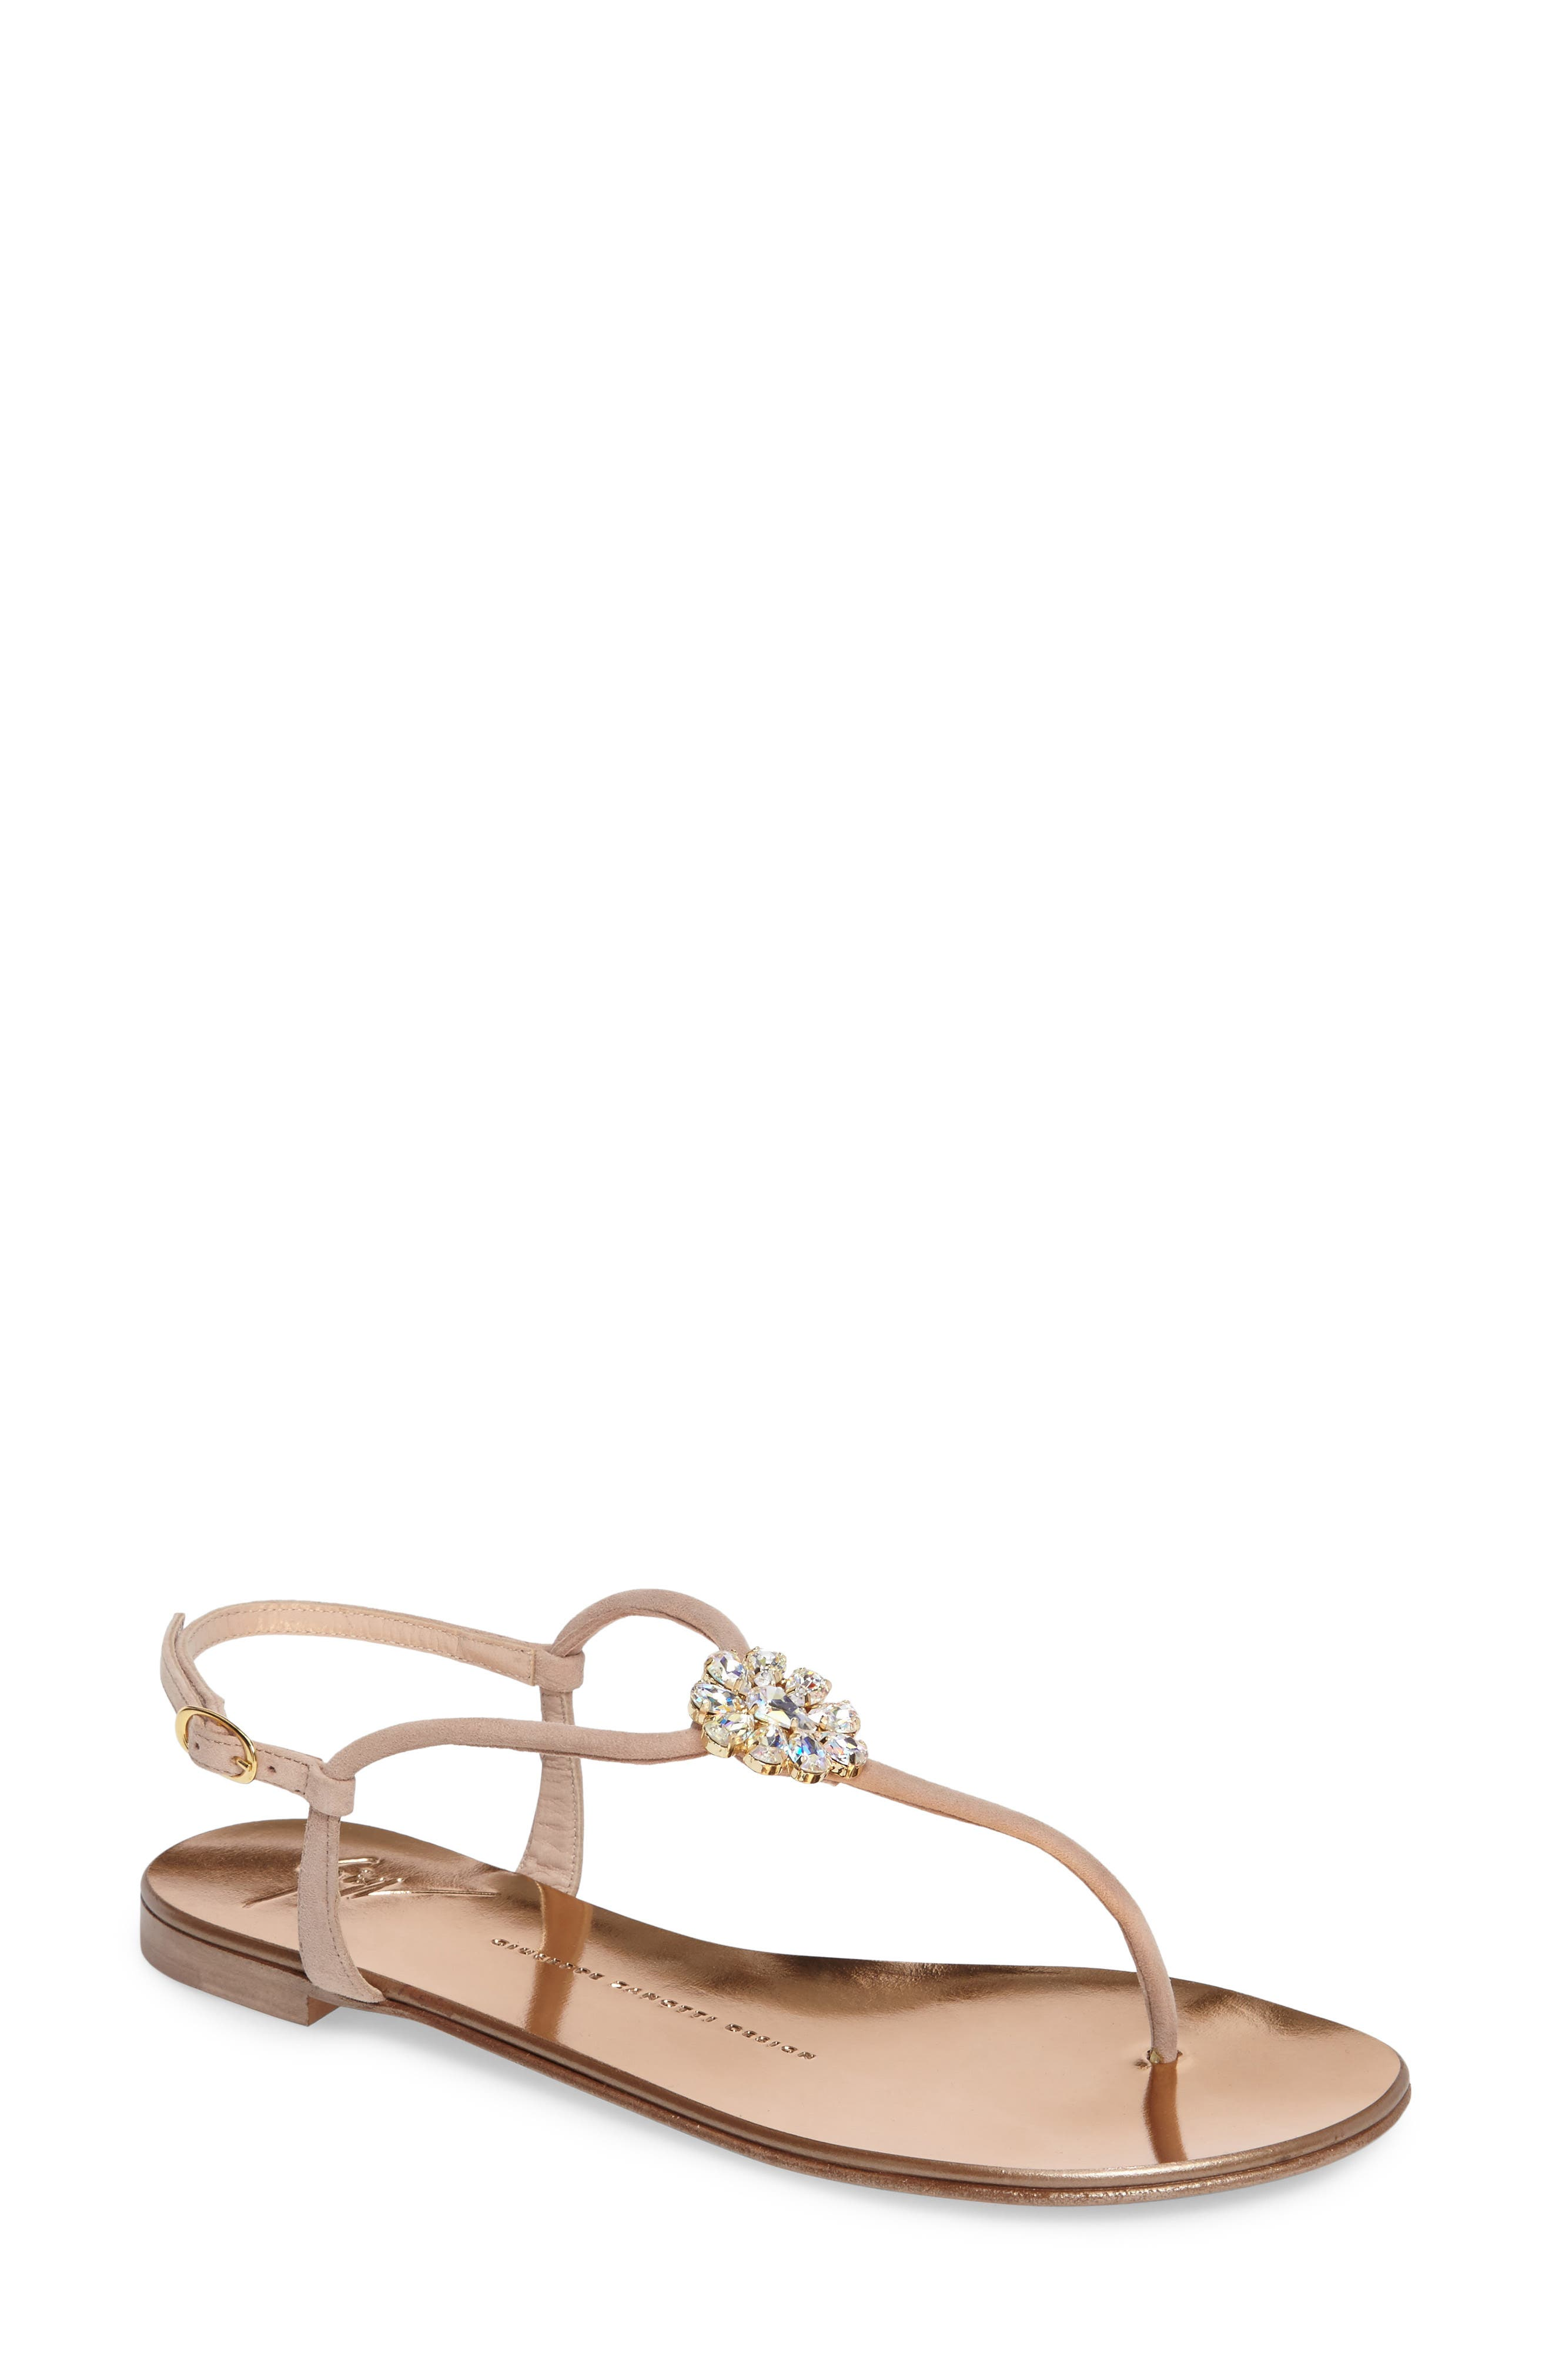 Crystal Sandal,                         Main,                         color, Nude